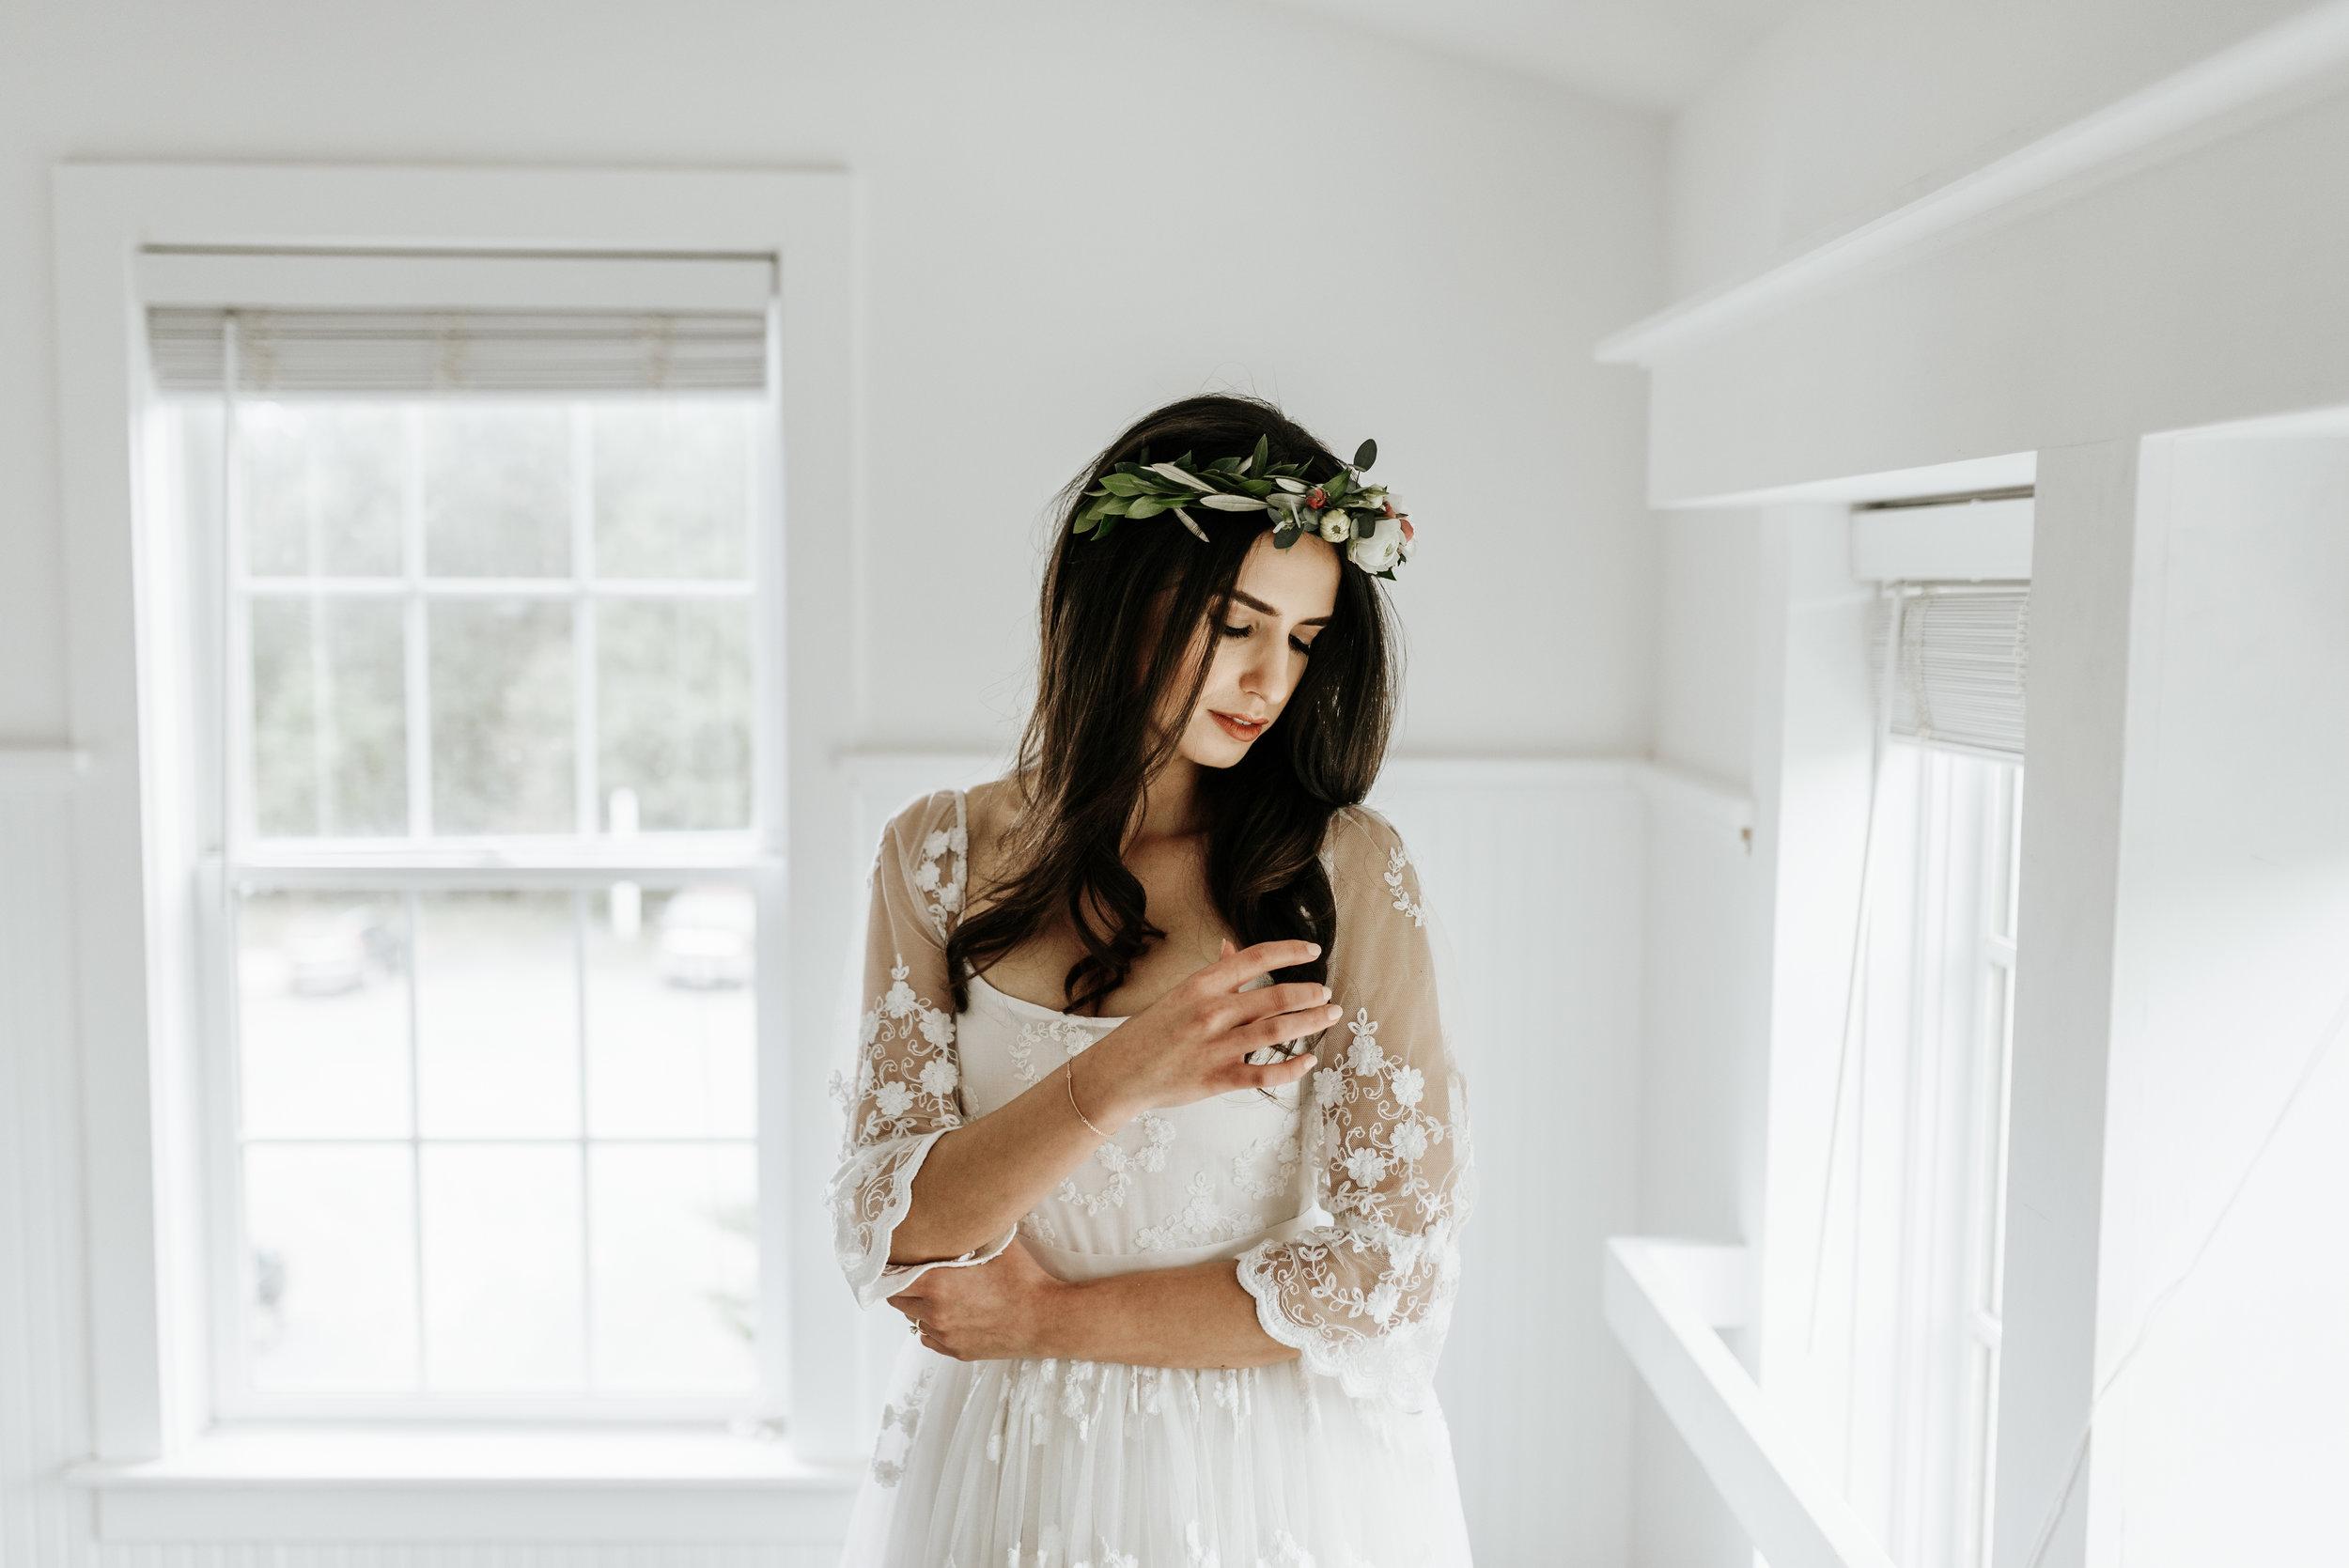 Veritas-Vineyards-and-Winery-Wedding-Photography-Afton-Virginia-Yasmin-Seth-Photography-by-V-9199.jpg